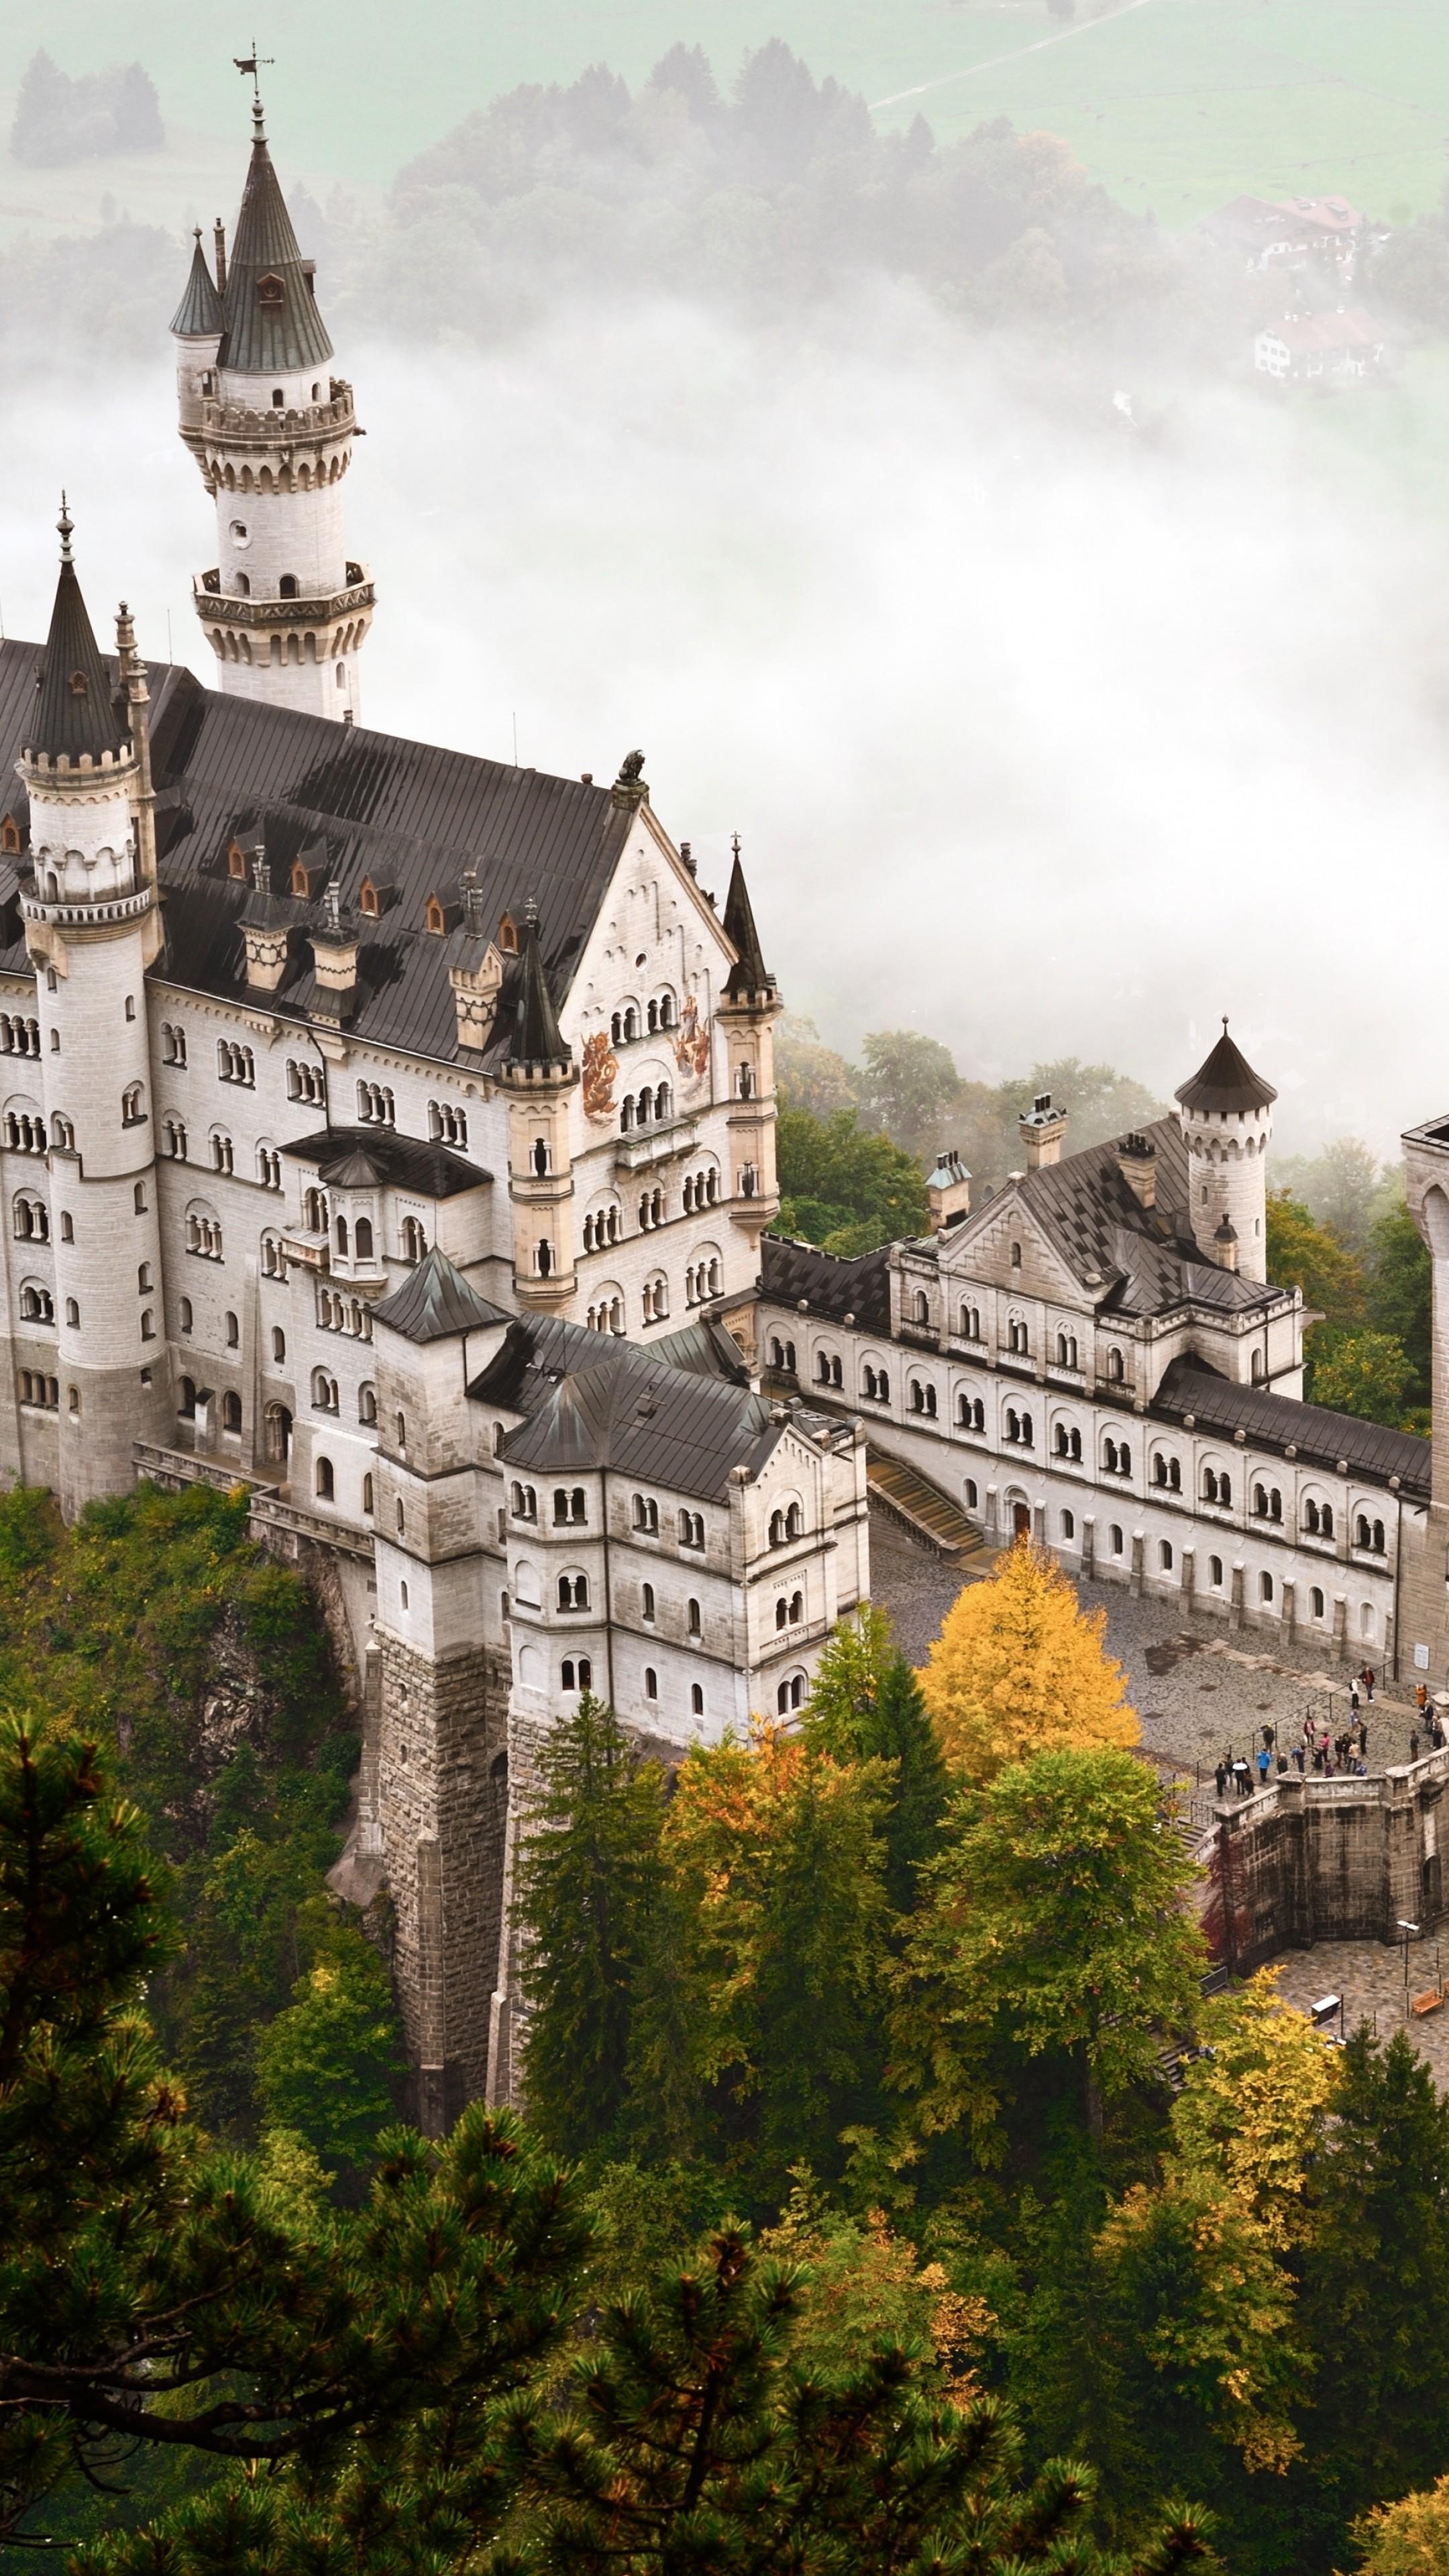 Us Military Hd Wallpapers Wallpaper Neuschwanstein Castle Bavaria Germany Tourism